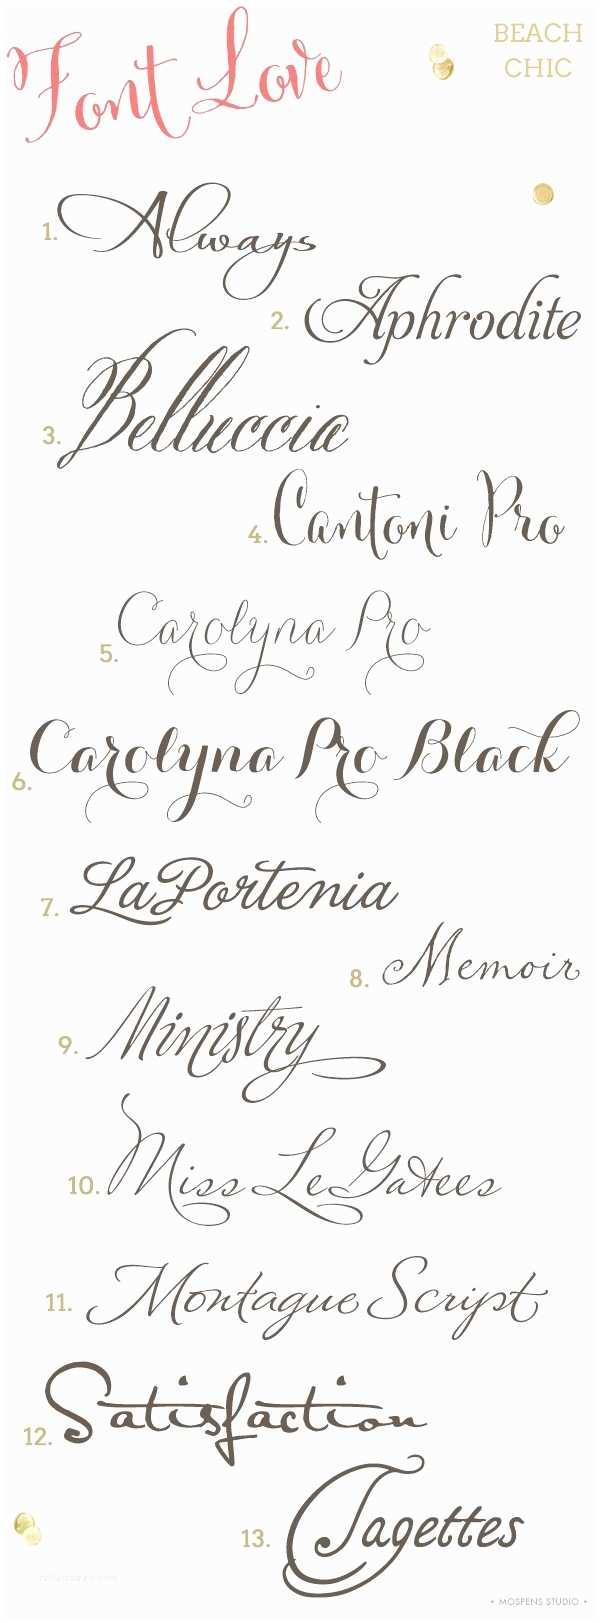 Typography Wedding Invitations Beach Wedding Invitation Fonts